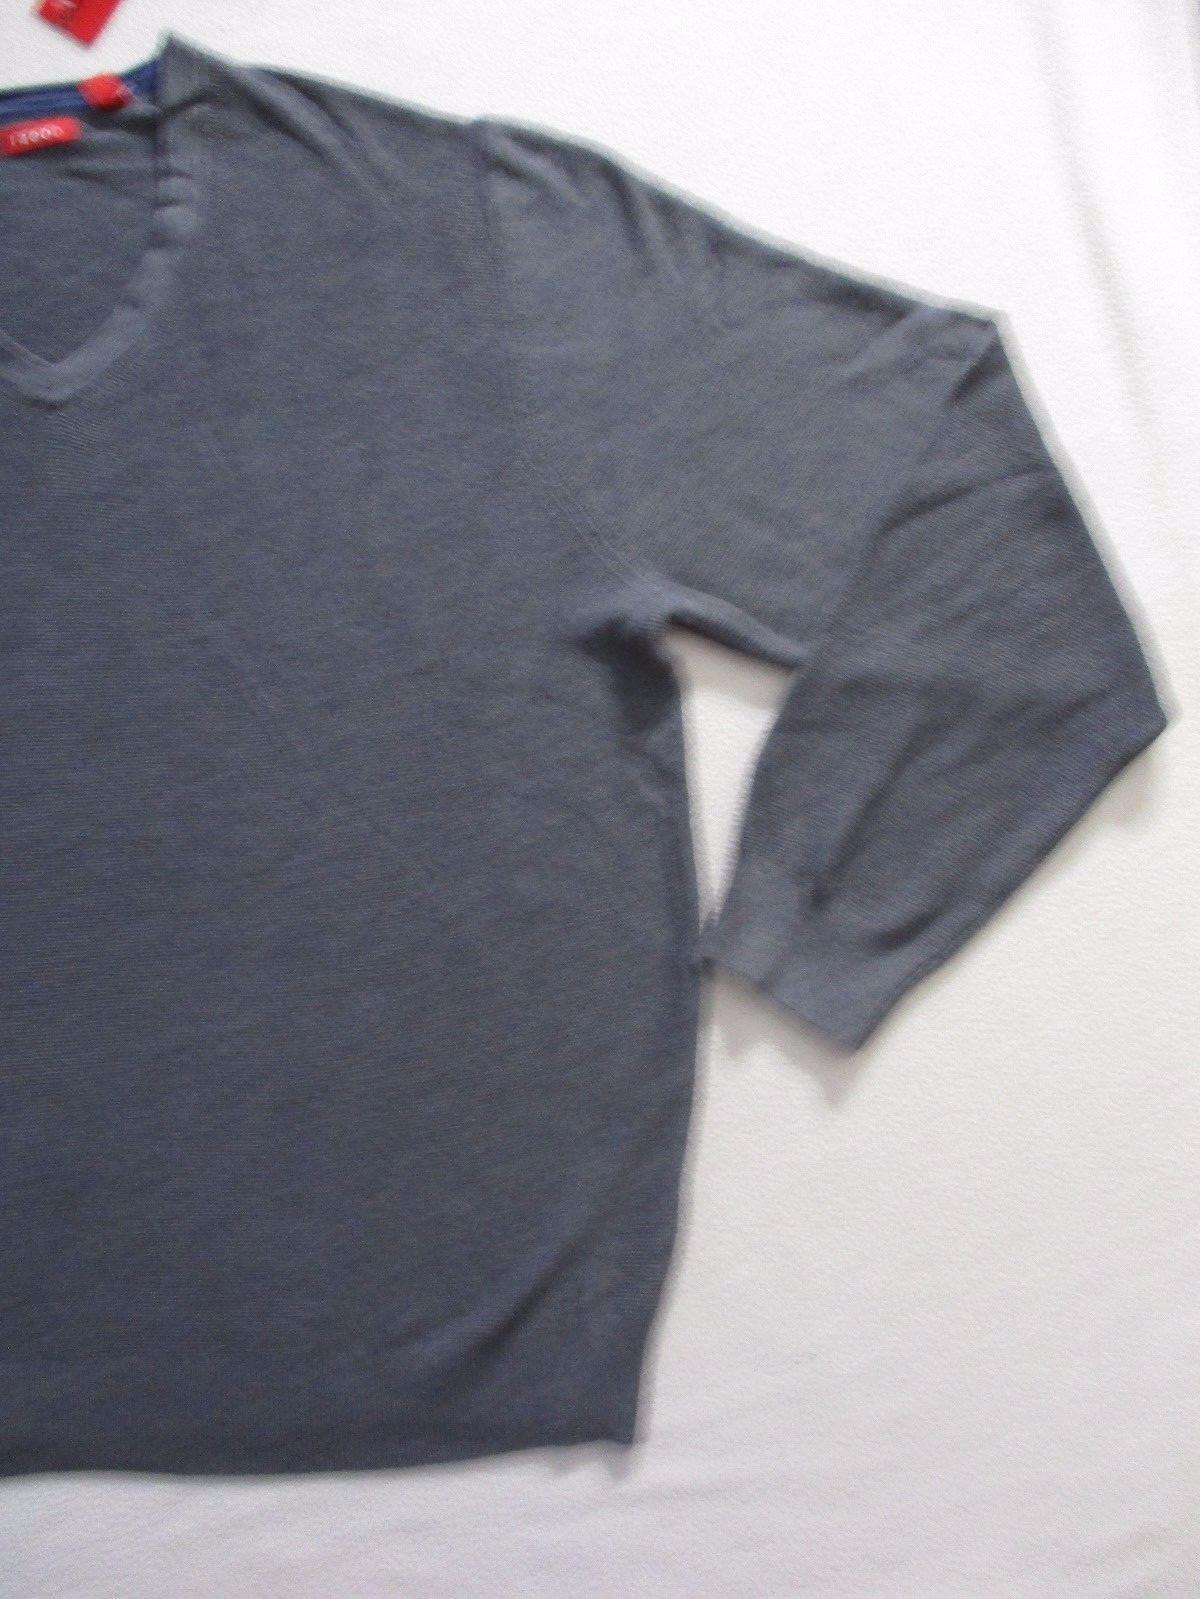 Izod Men Sweater 2XL Gray Solid V Neck Long Sleeves Cotton 1700E